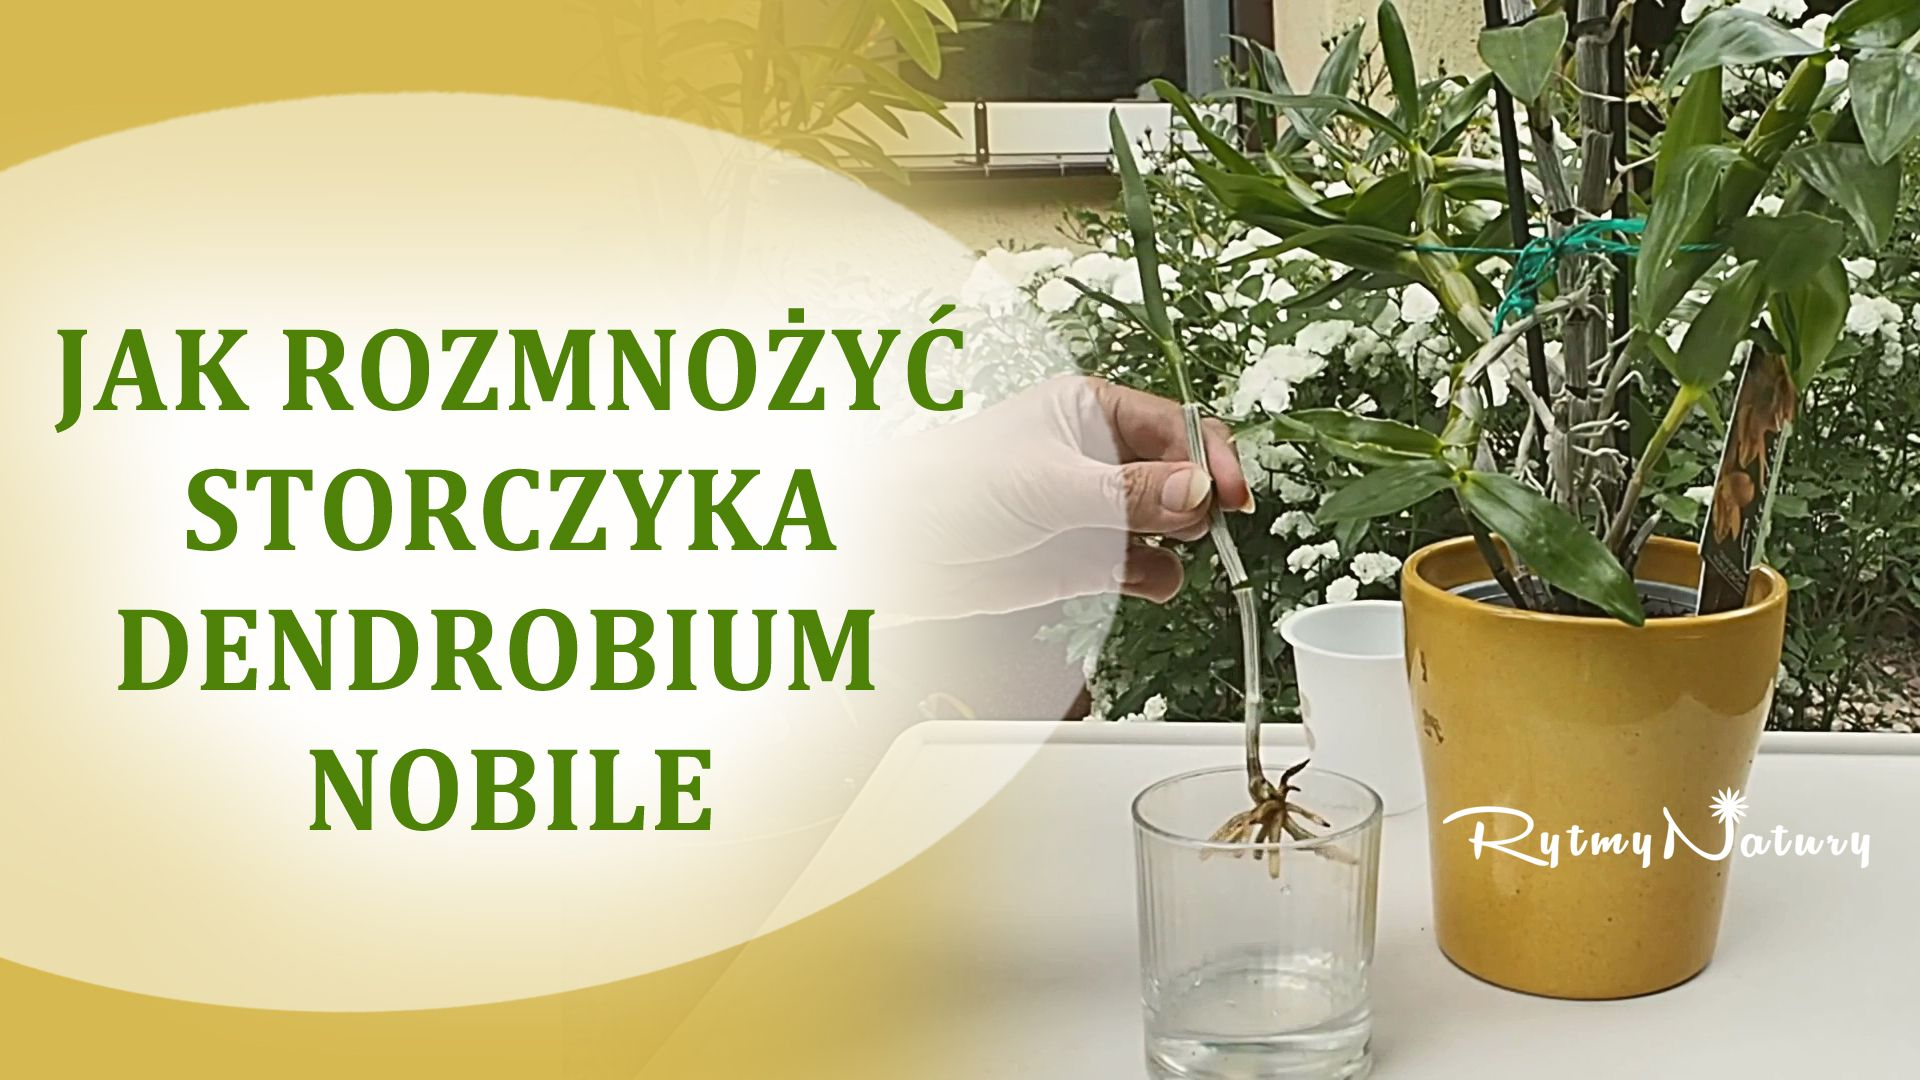 Jak Rozmnozyc Storczyka Dendrobium Nobile Dendrobium Nobile